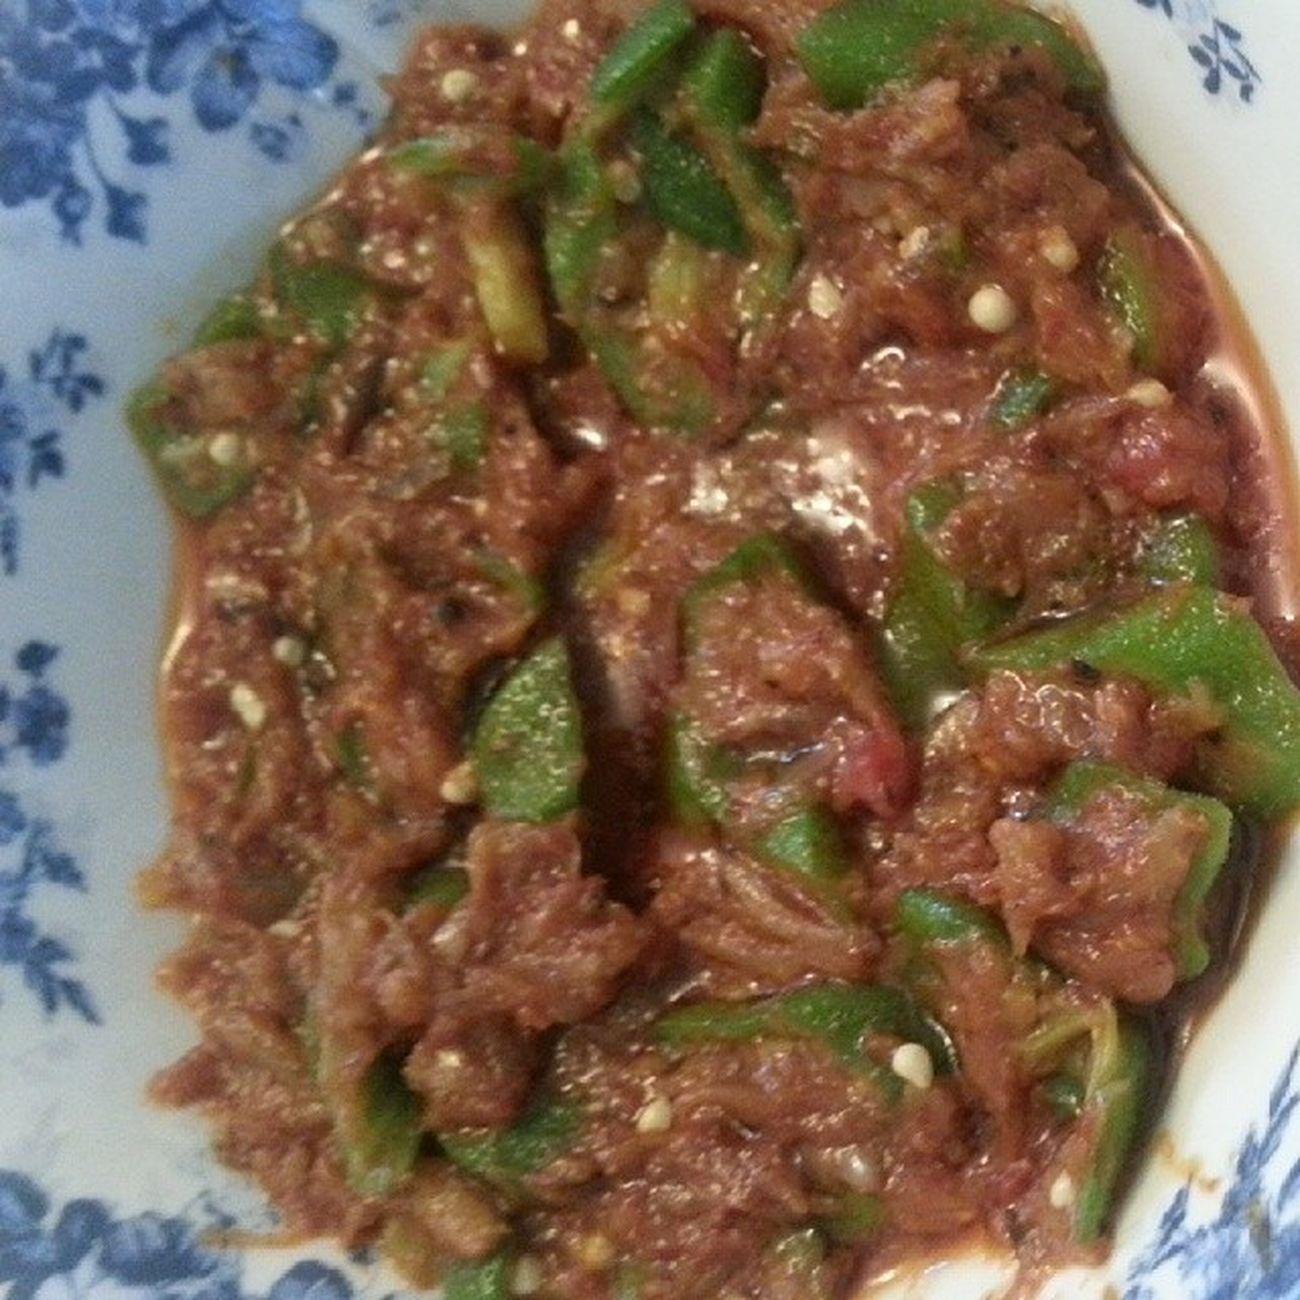 Sambalbelacan Ladyfingers cooked by @harmoneylate Foods Lunch